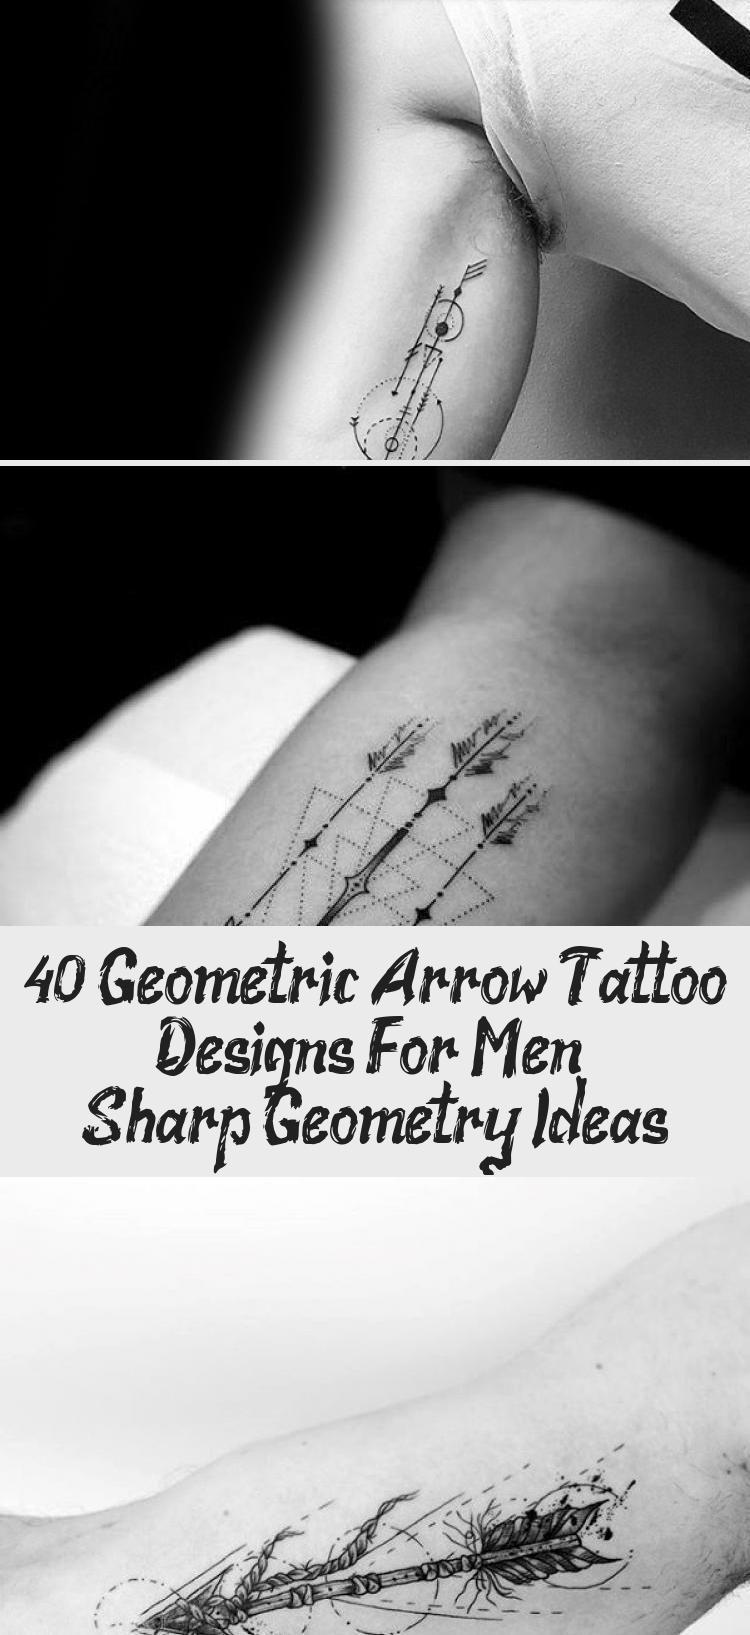 40 Geometric Arrow Tattoo Designs For Men  Sharp Geometry Ideas  Tattoo Blog  40 Geometric Arrow Tattoo Designs For Men  Sharp Geometry Ideas  Tattoo Blog  Cool Male G